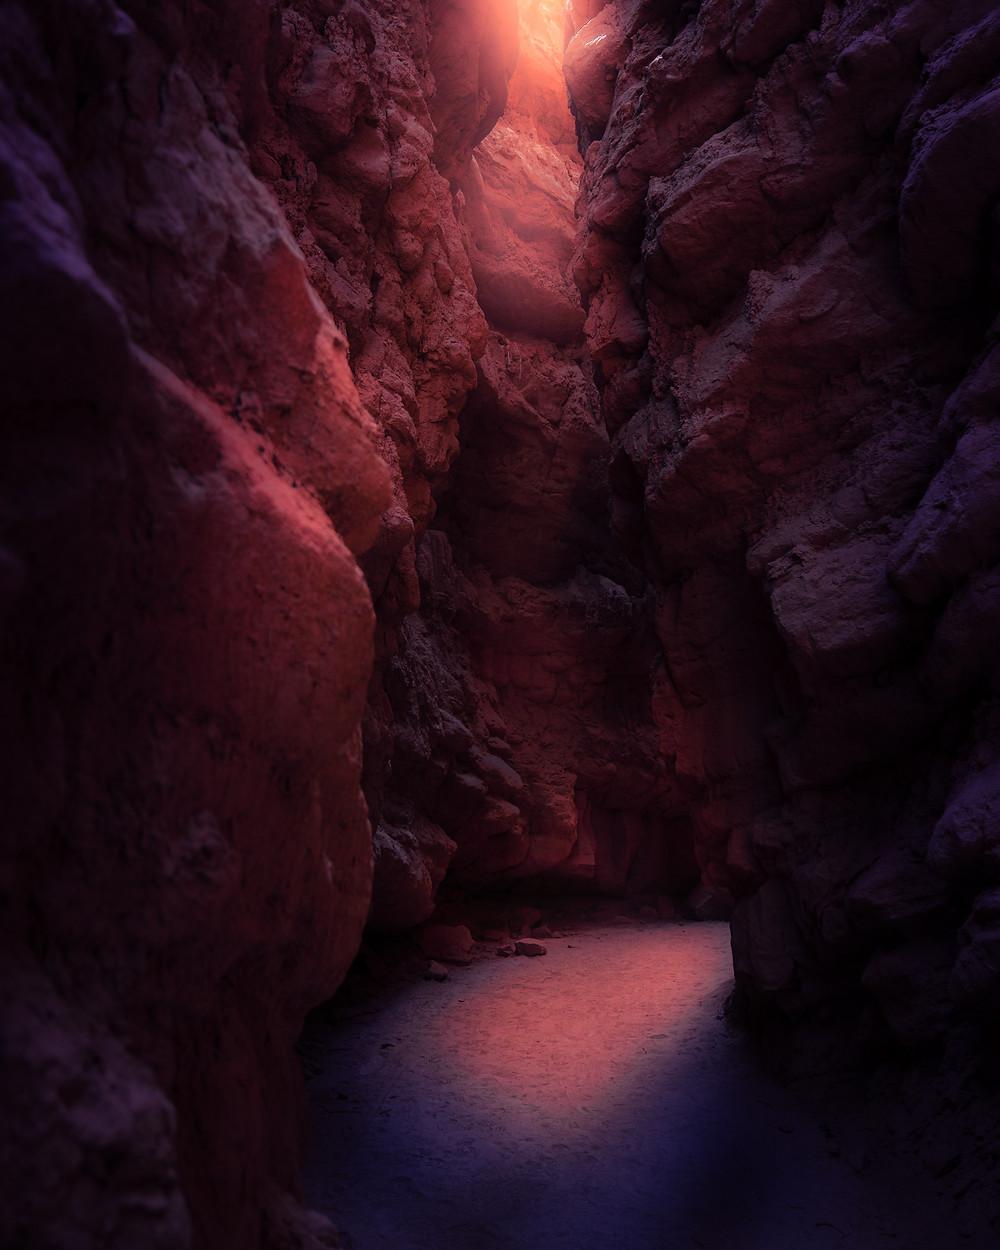 light entering a dark slot canyon hiking trail